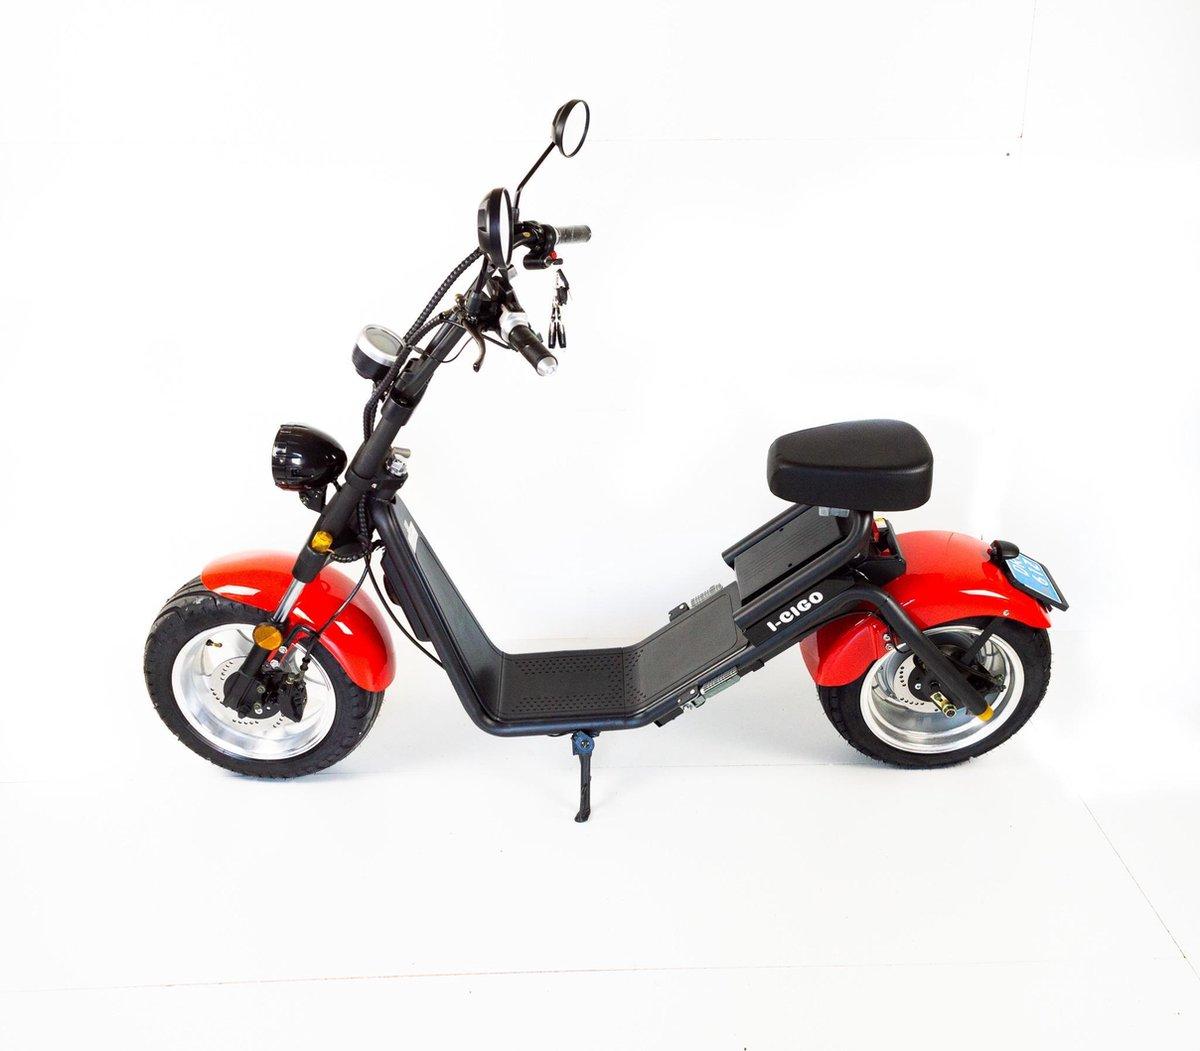 Stadscooter Citycoco,City coco Rood met blauw kenteken( E-Scooter ebike 100% Elektrische scooter Coo